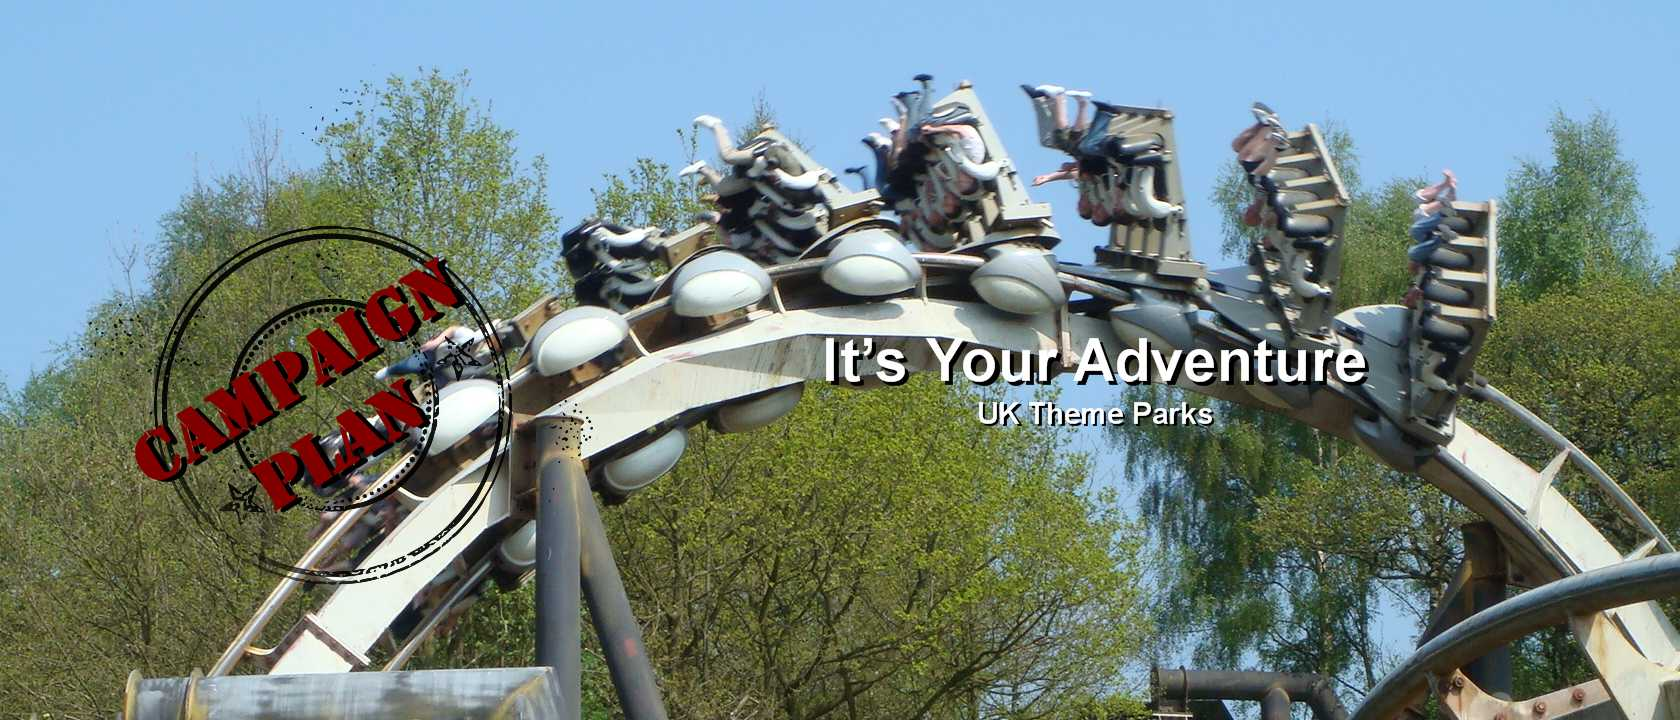 Tips Hacks And Tricks For Visiting Uk Theme Parks Uk